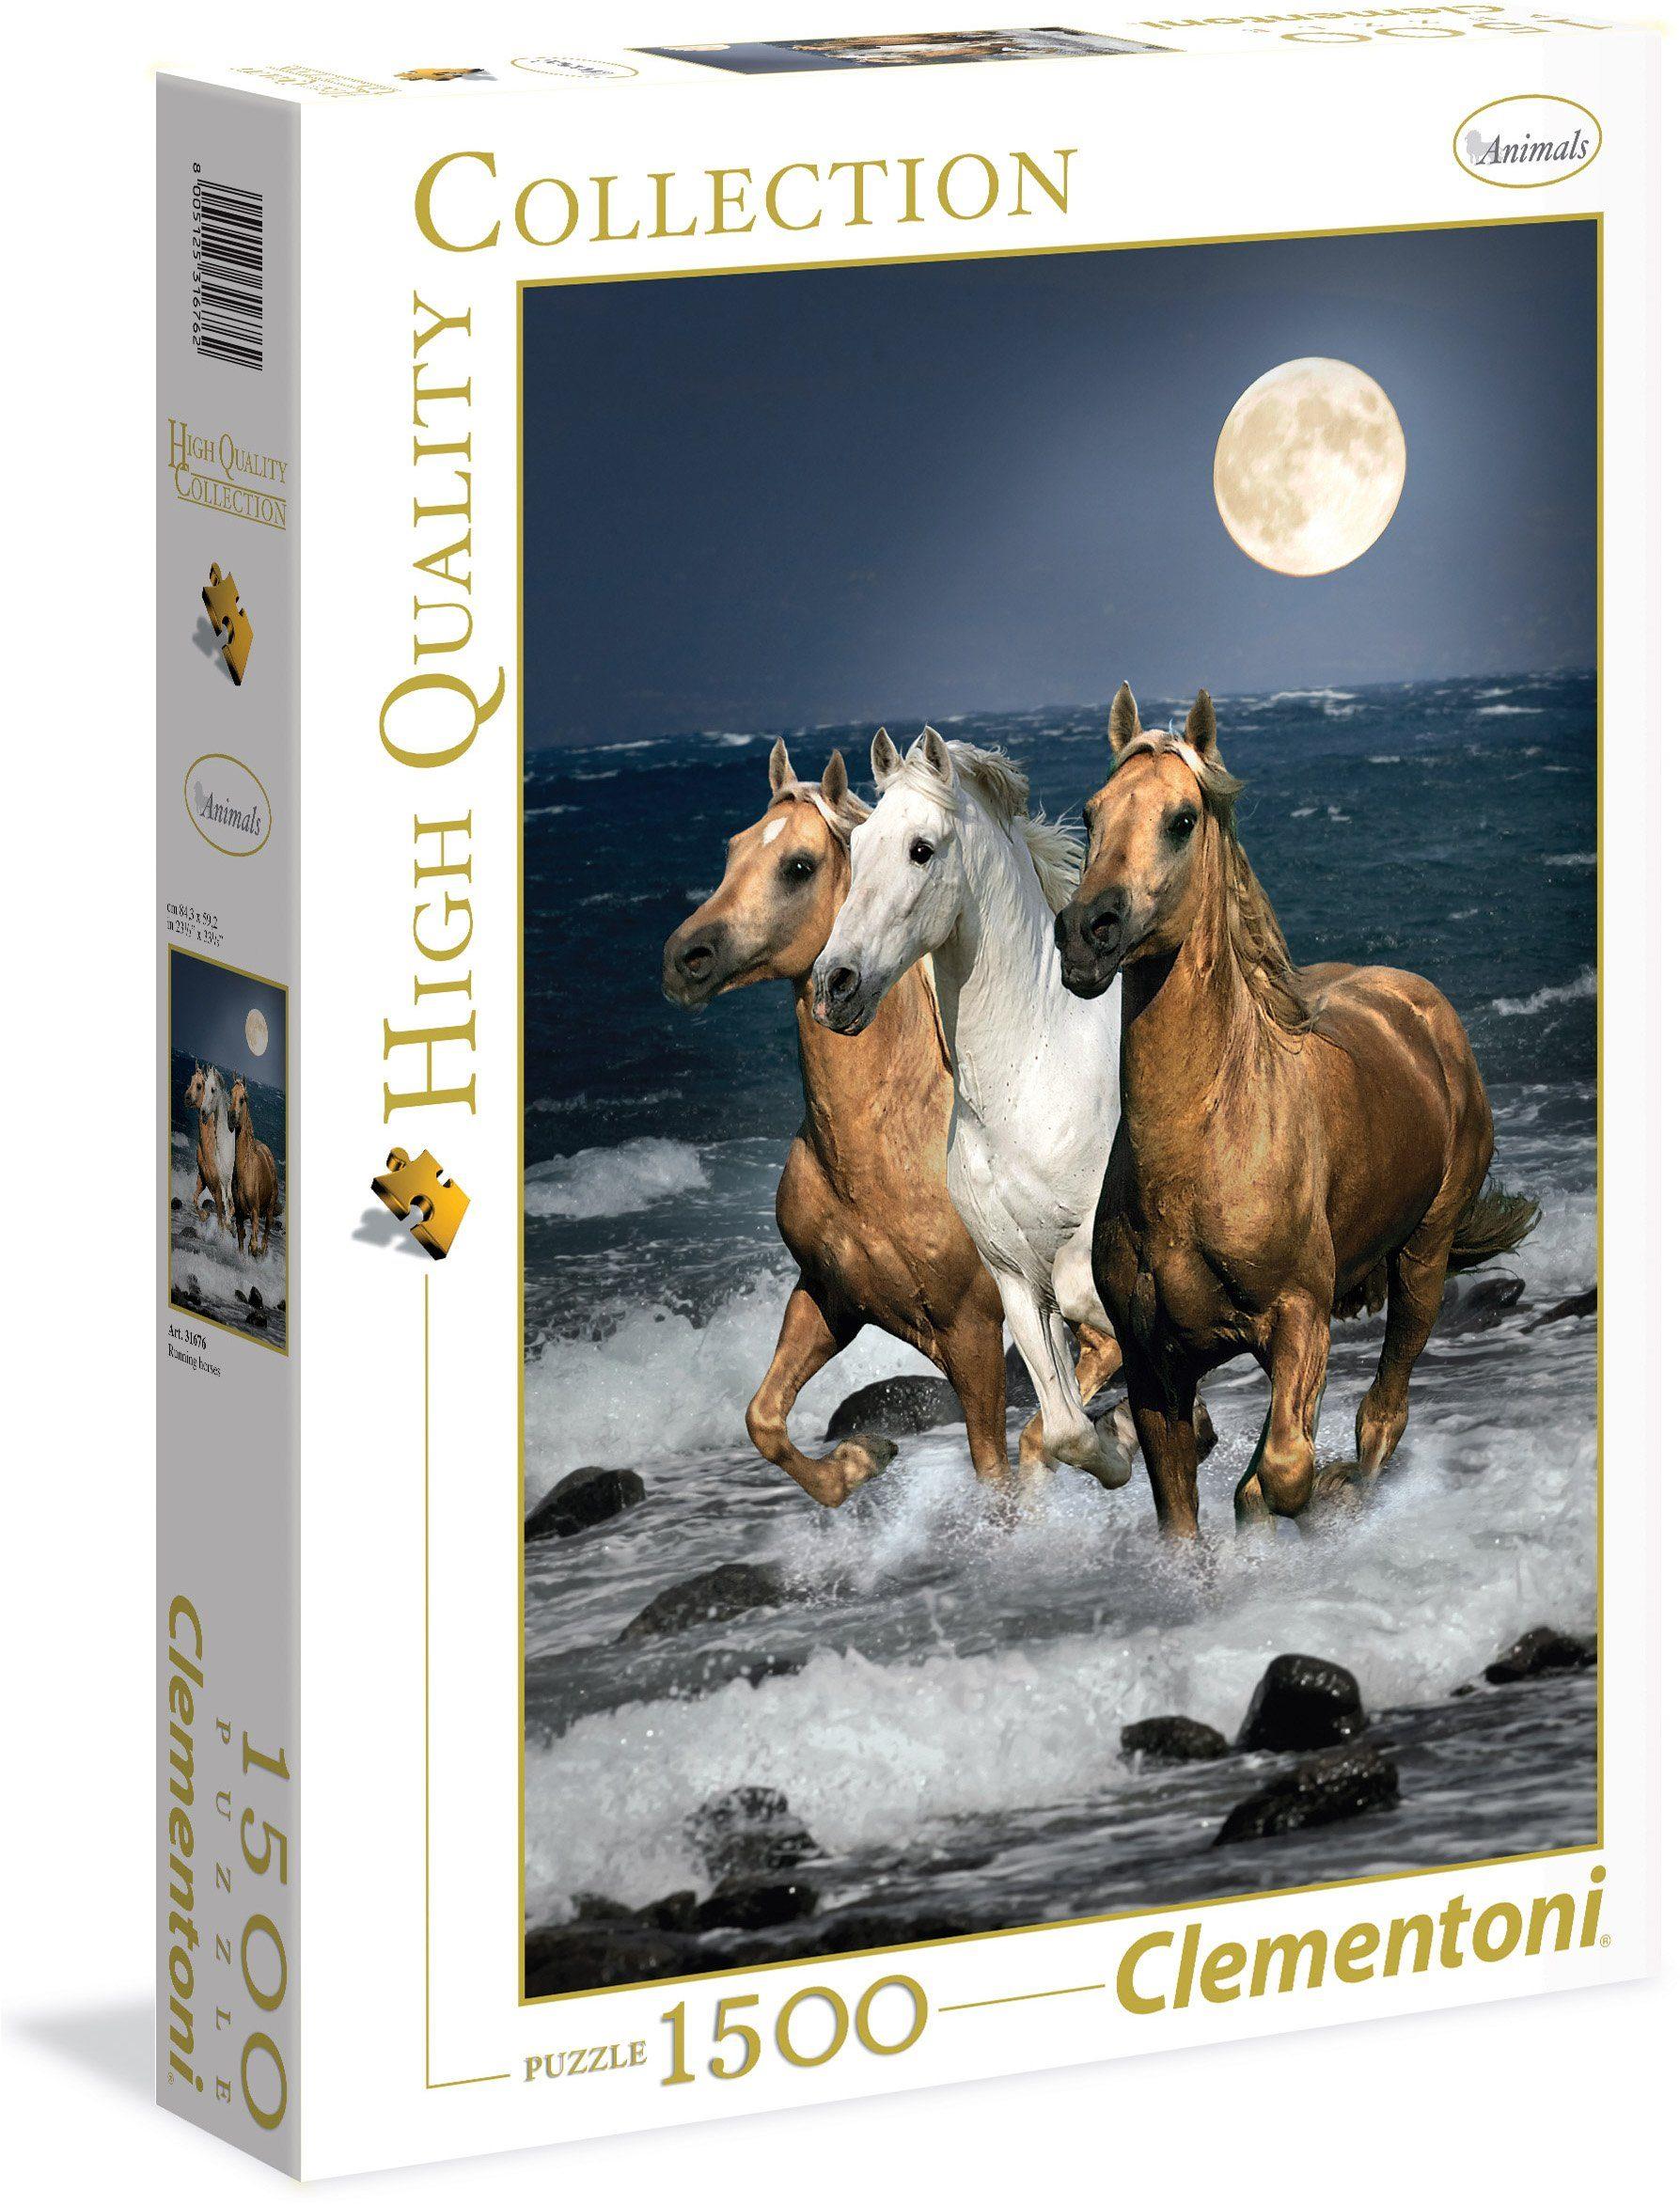 Clementoni Puzzle, 1500 Teile, »Galoppierende Pferde«